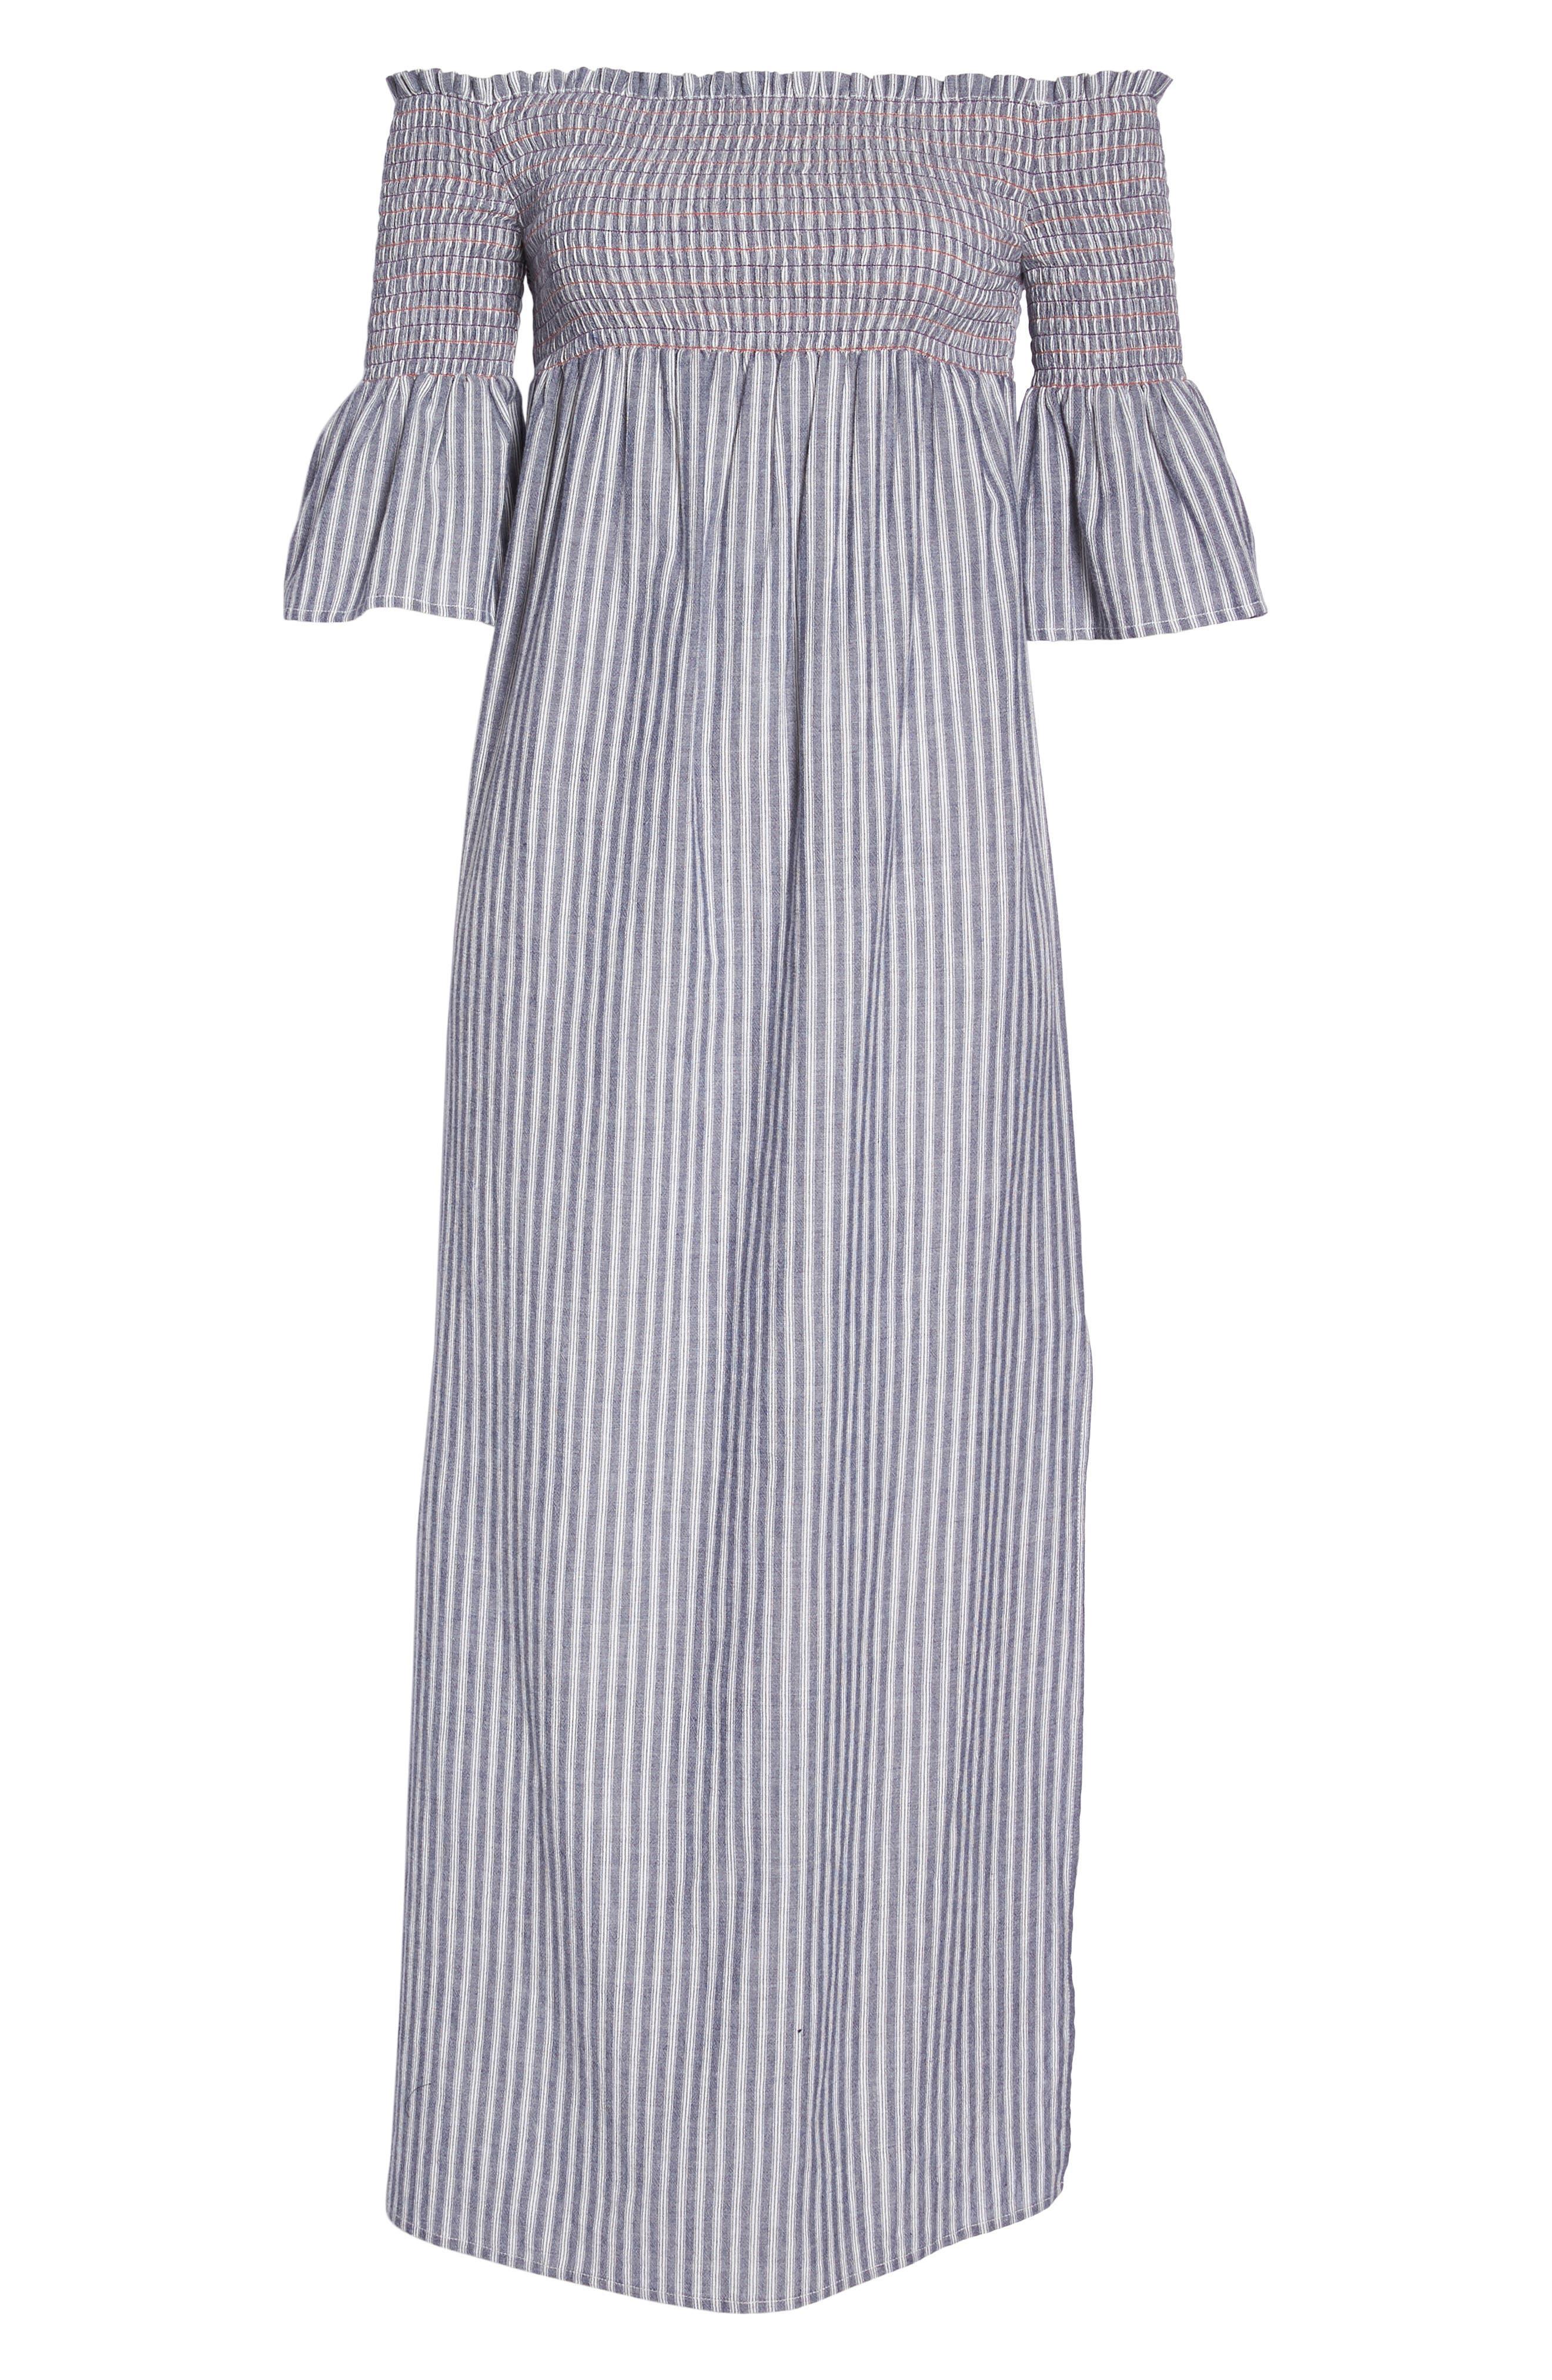 Carmel Smocked Off the Shoulder Maxi Dress,                             Alternate thumbnail 7, color,                             428